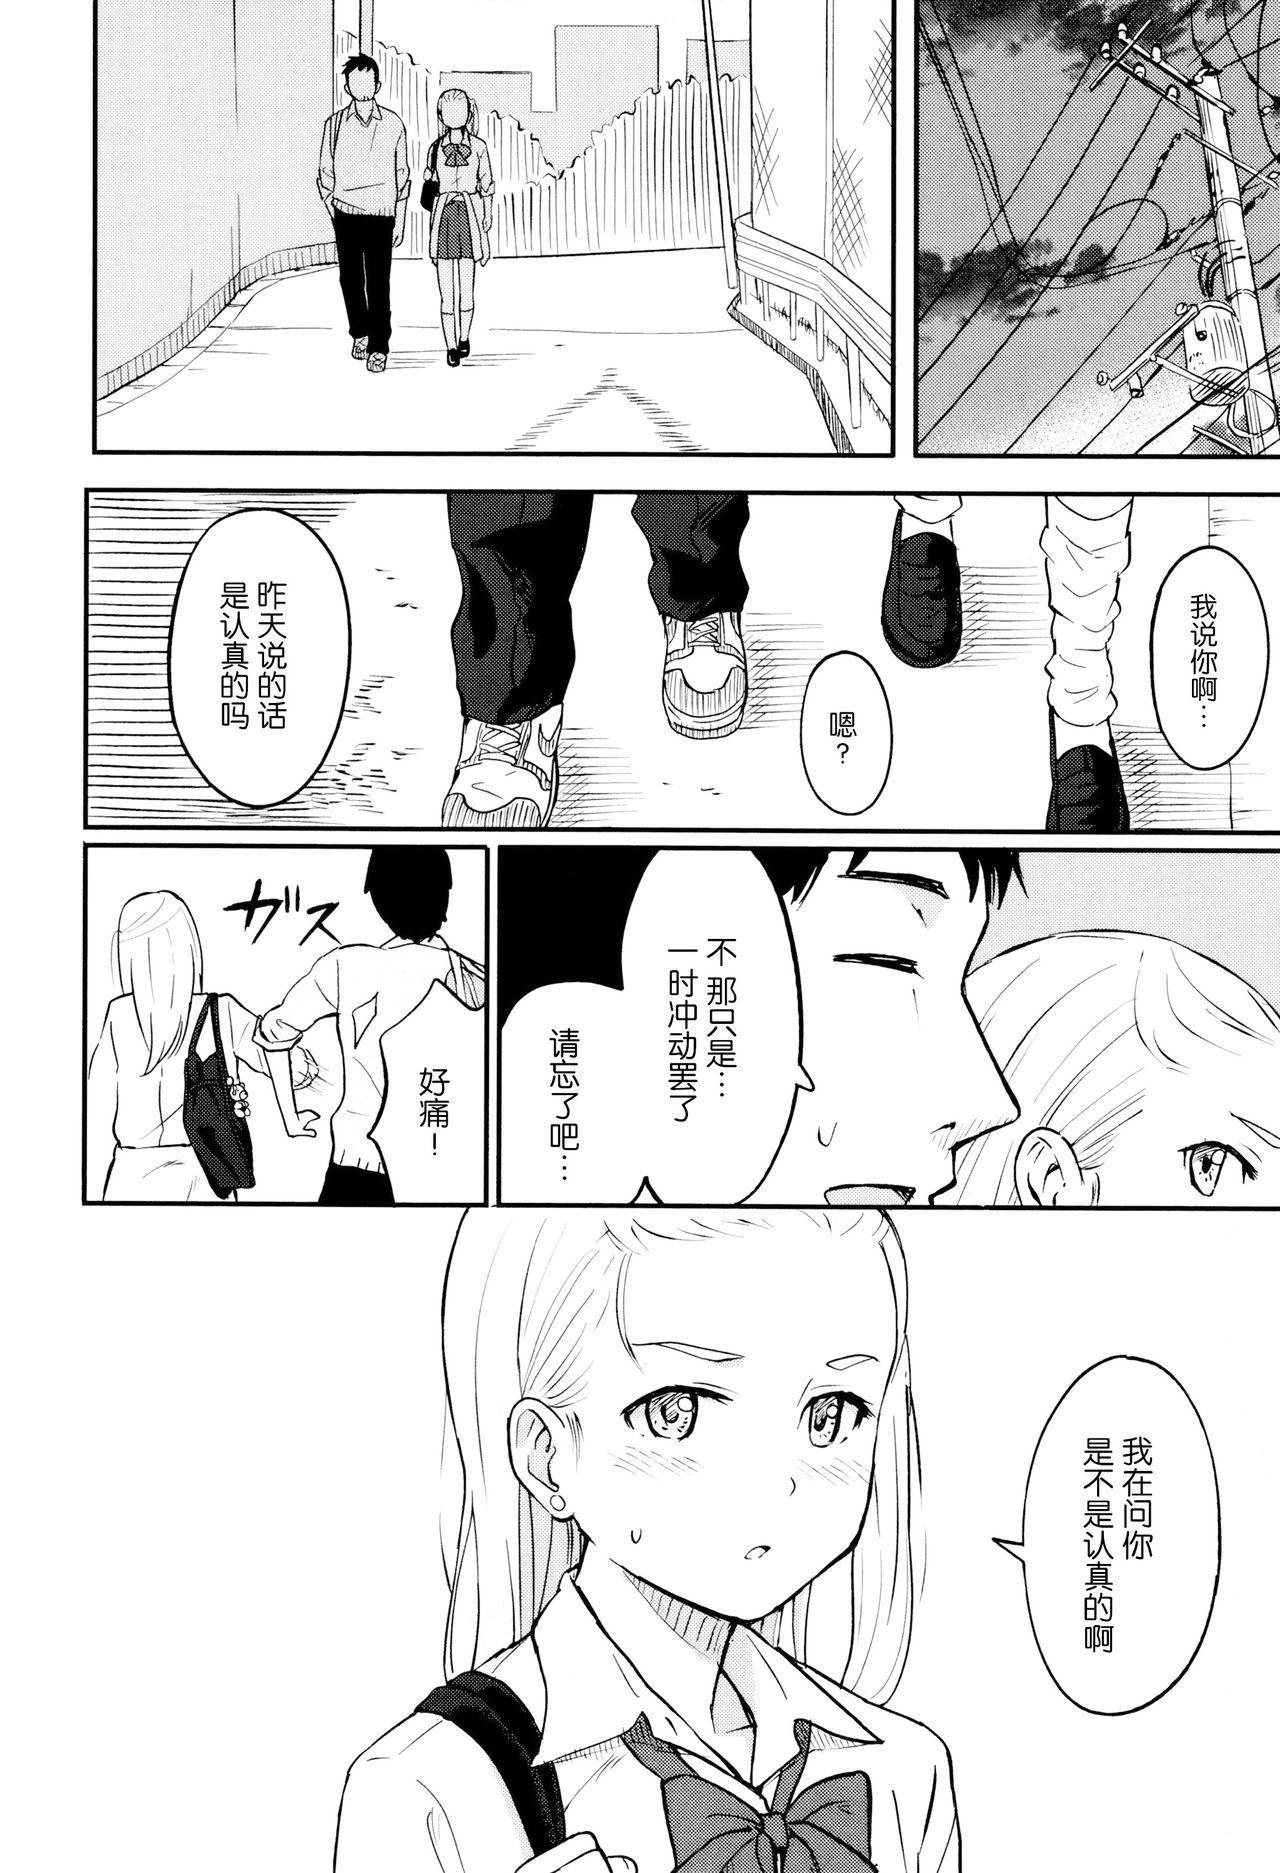 Tokubetsu na Mainichi - Special daily 74